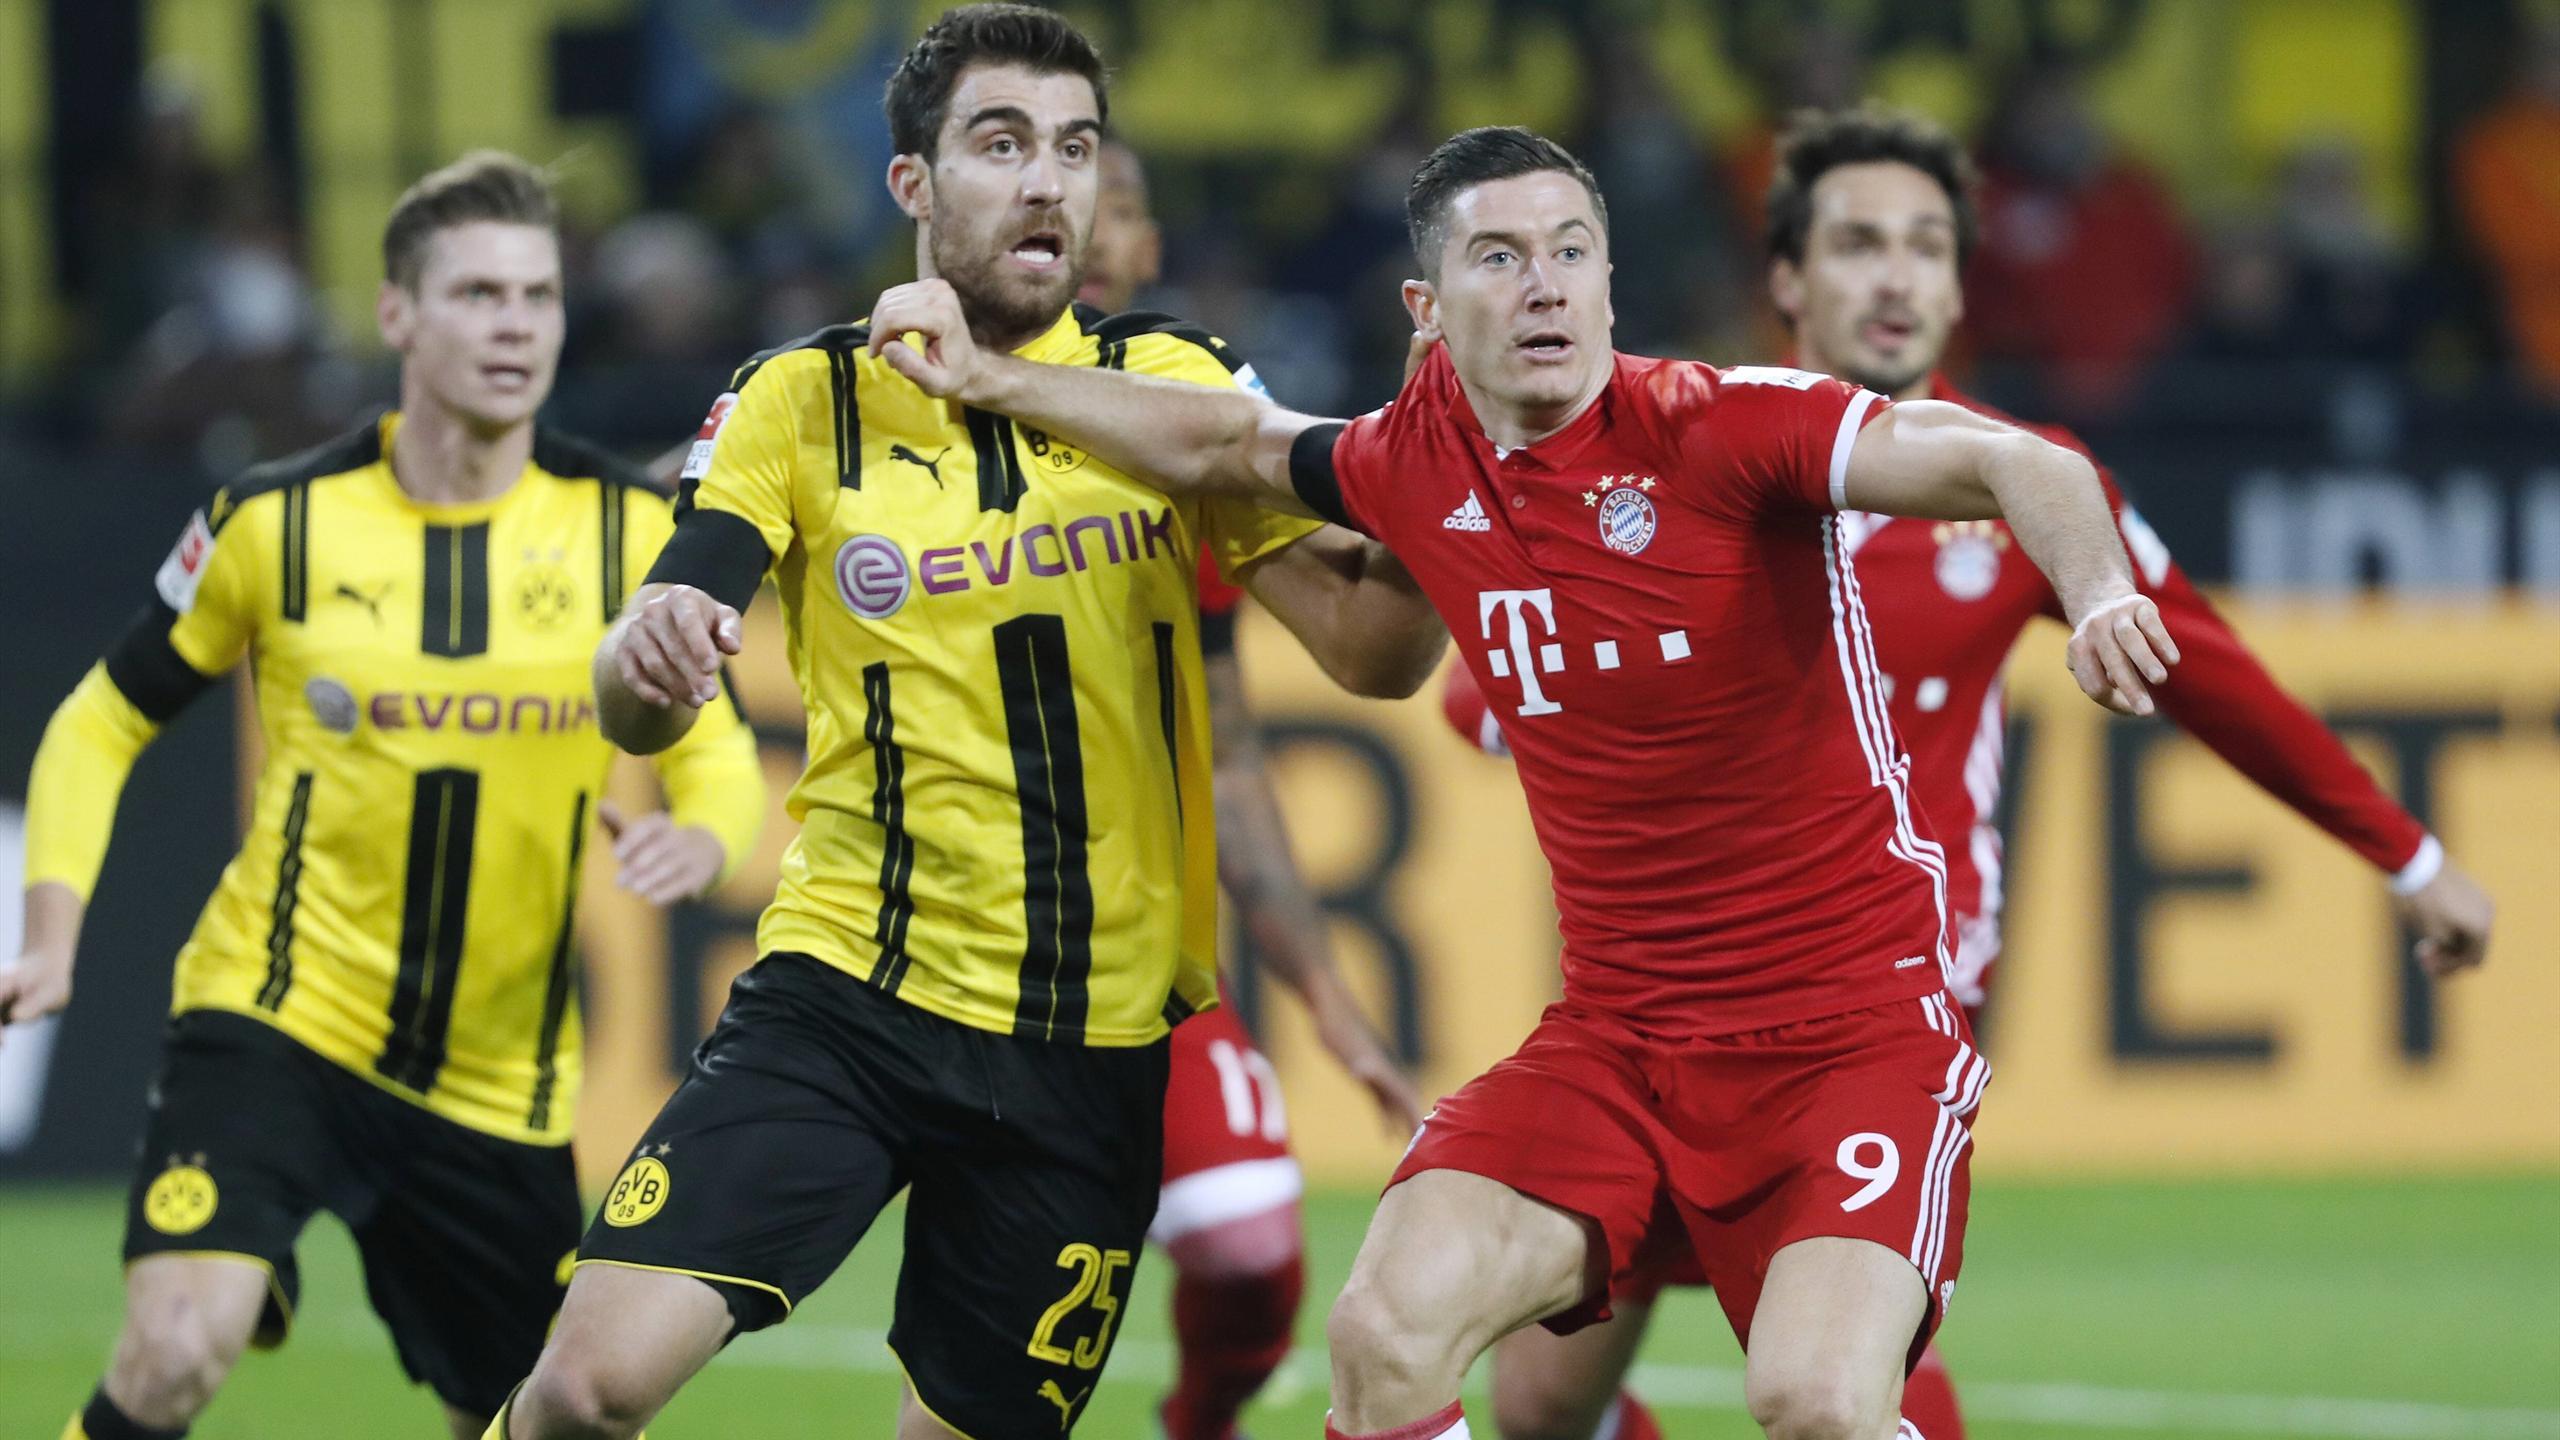 Dfb Bayern Dortmund 2021